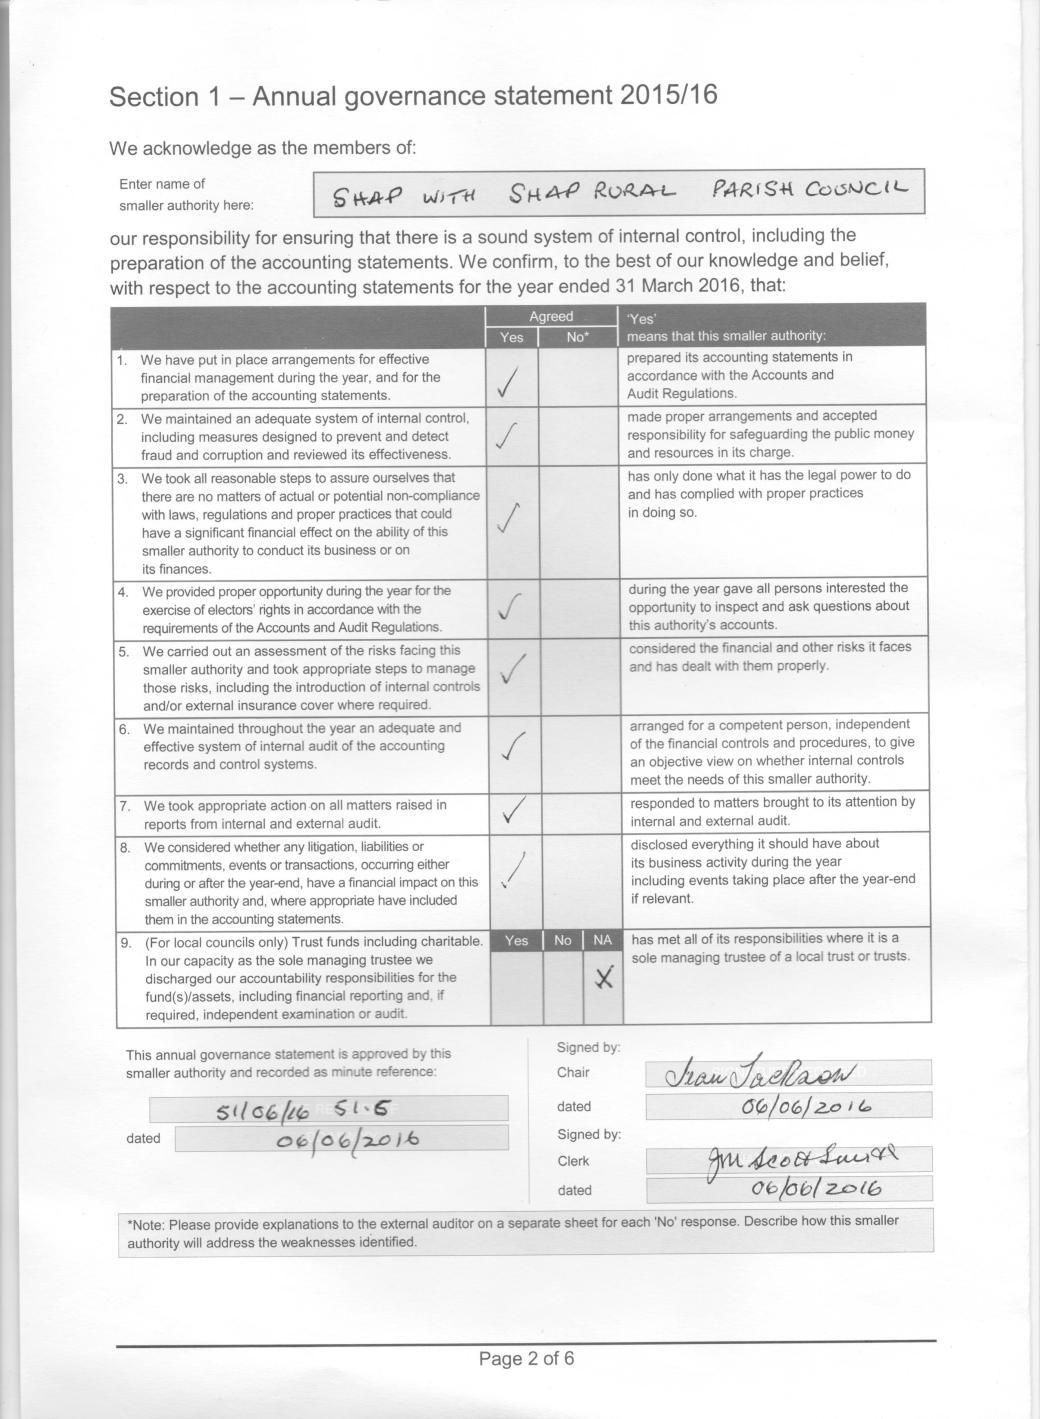 annual-governance-statement